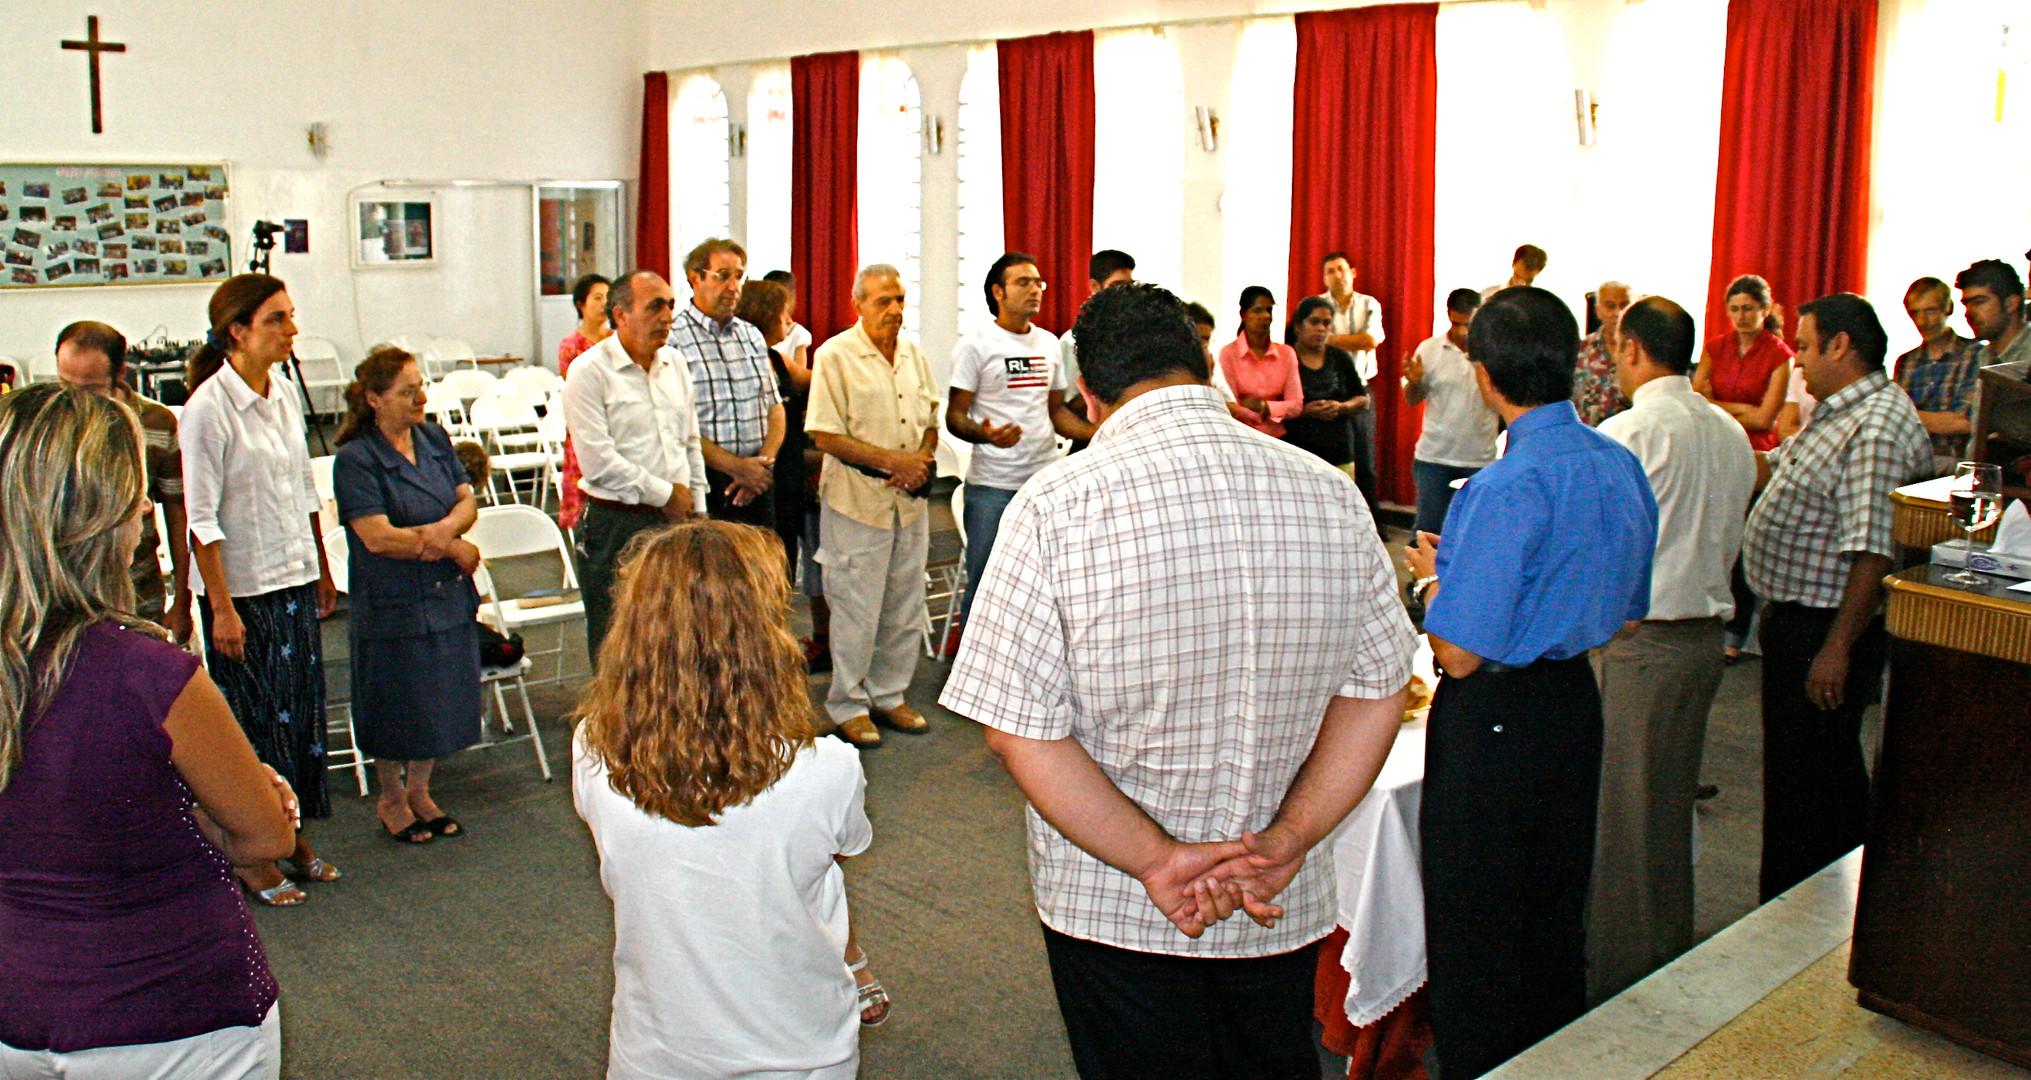 Pastors' Conference in Beirut